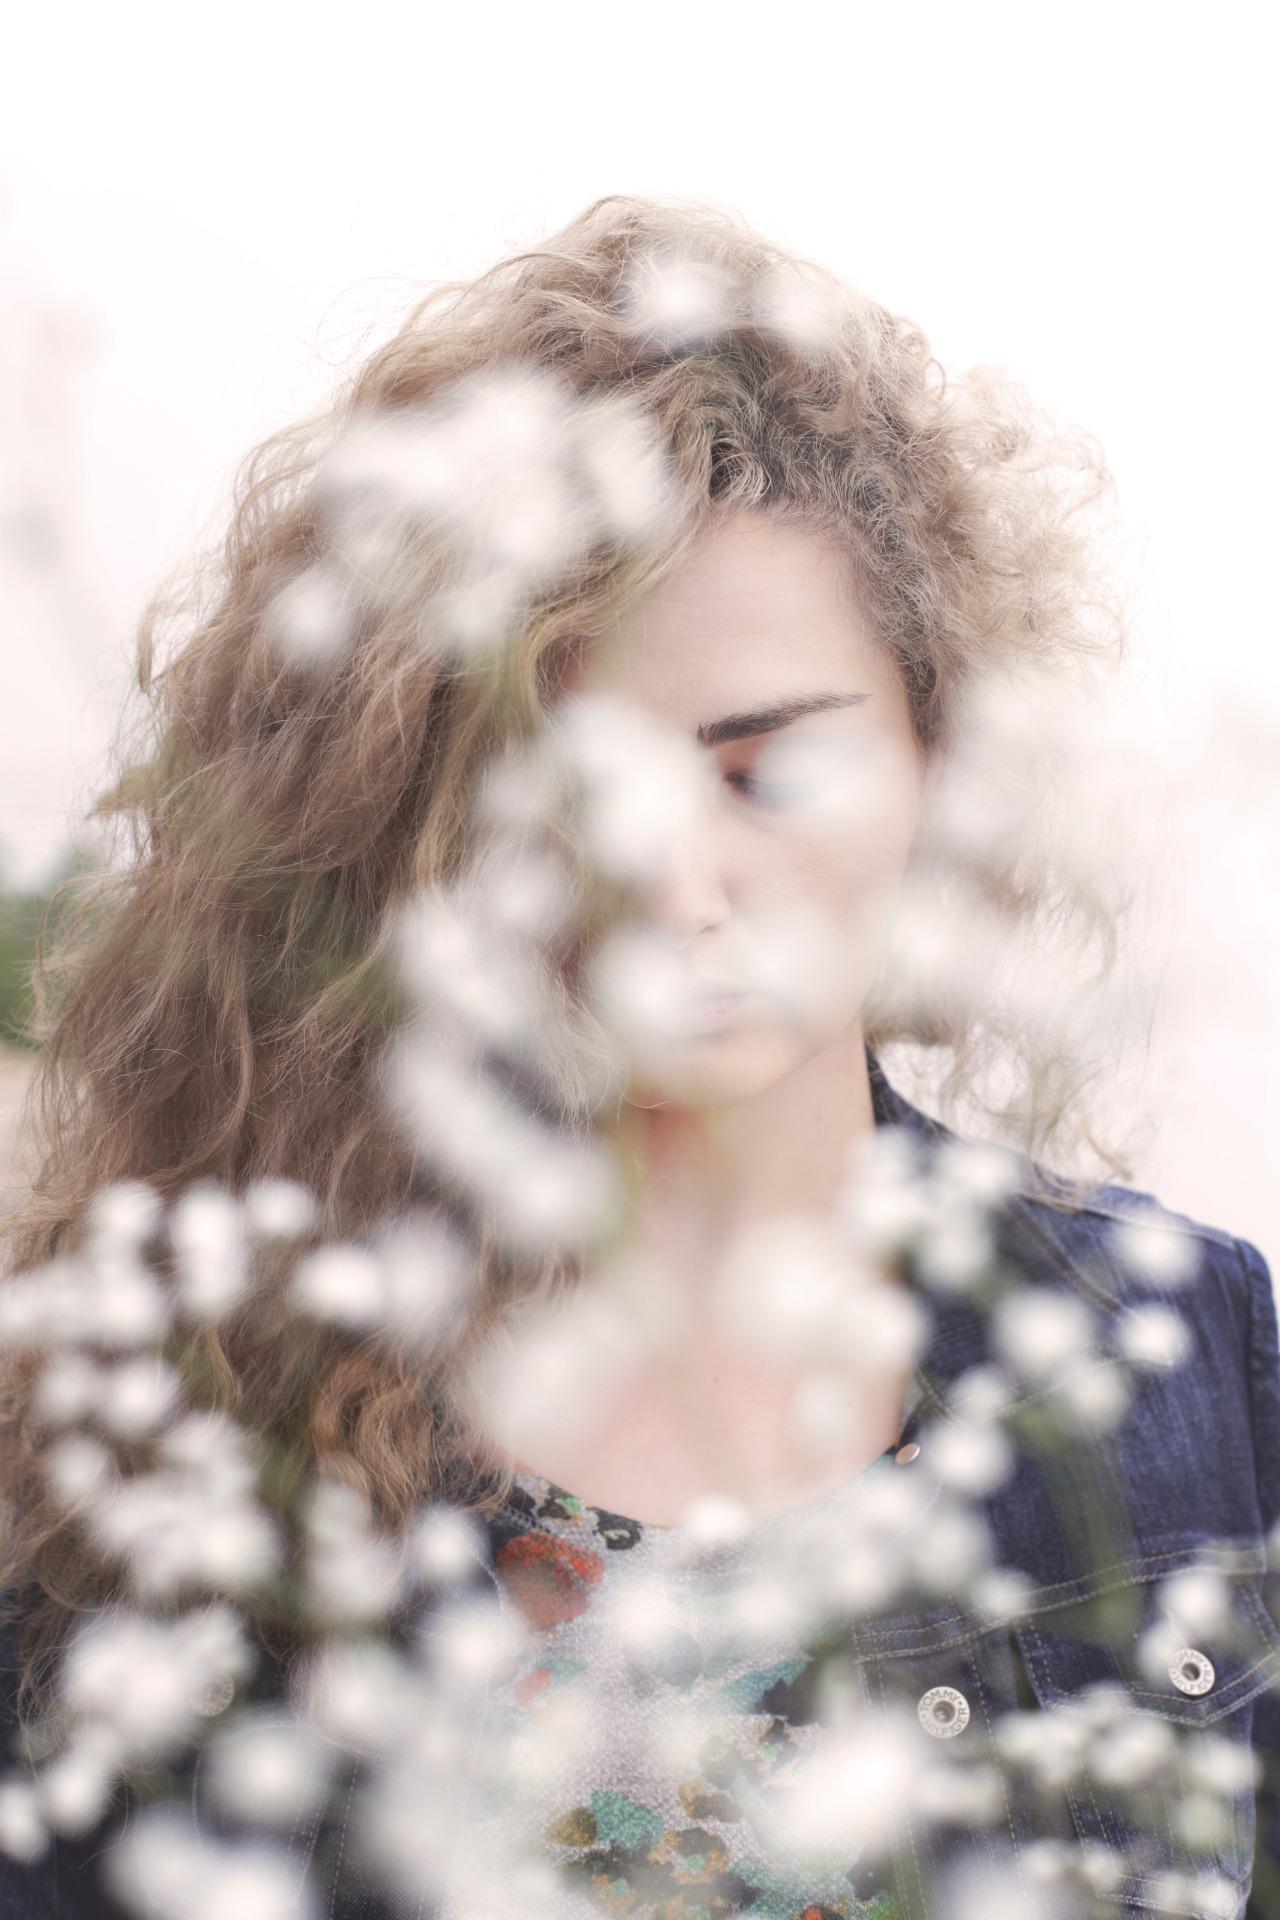 Self Portrait | Strawberry Peak | Los Angeles, June 2015